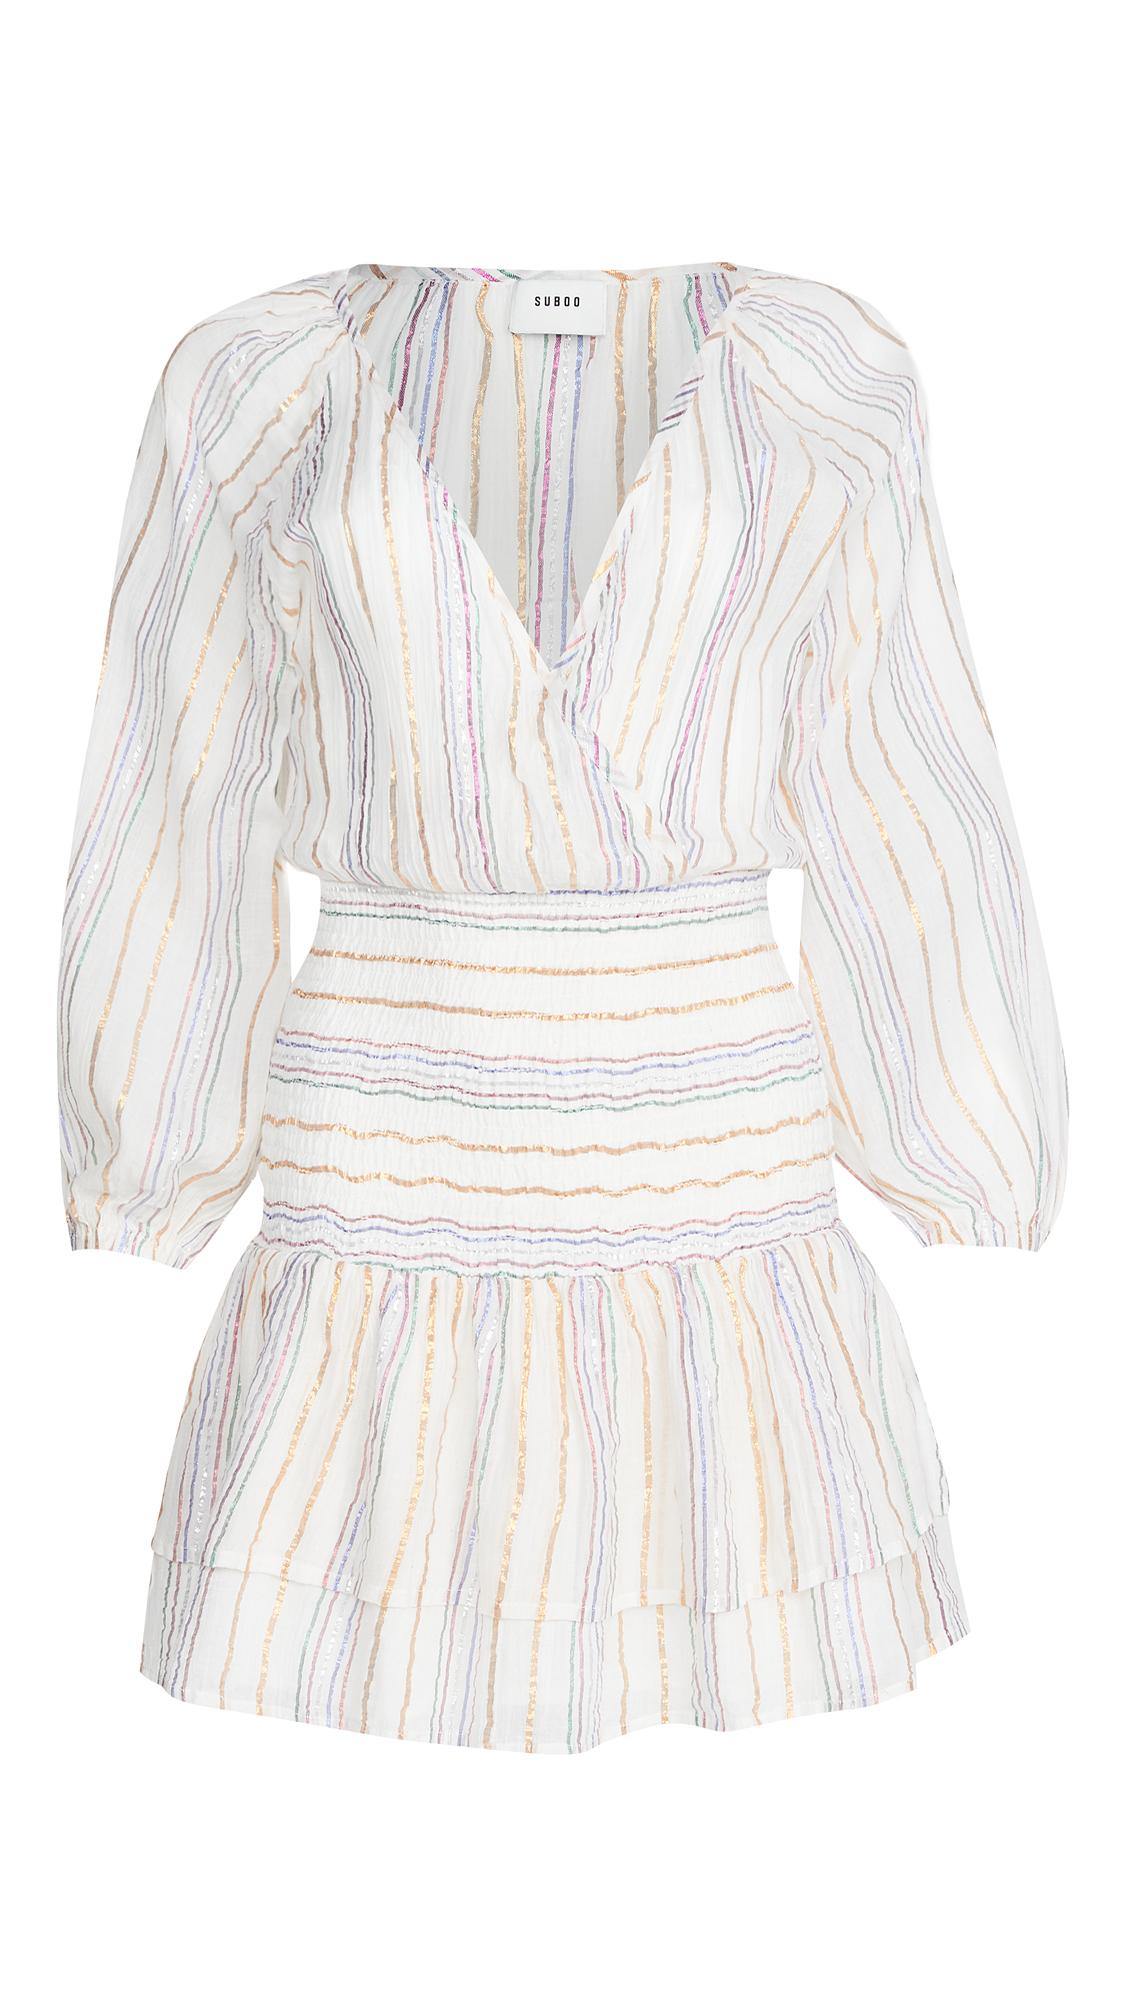 Suboo Giselle Shirred Mini Dress